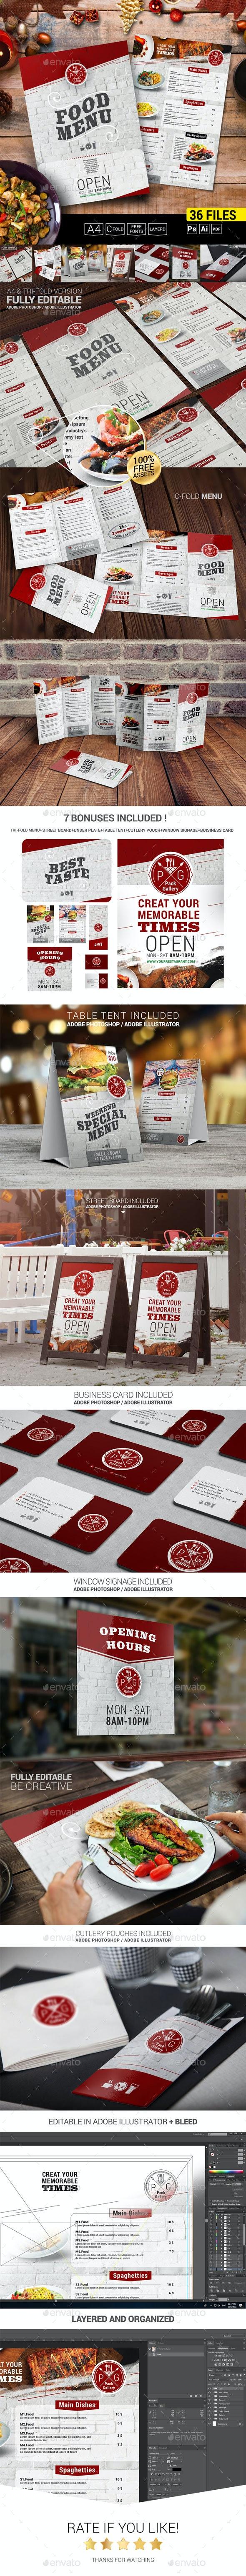 Food Menu + 7 Bonuses - Food Menus Print Templates